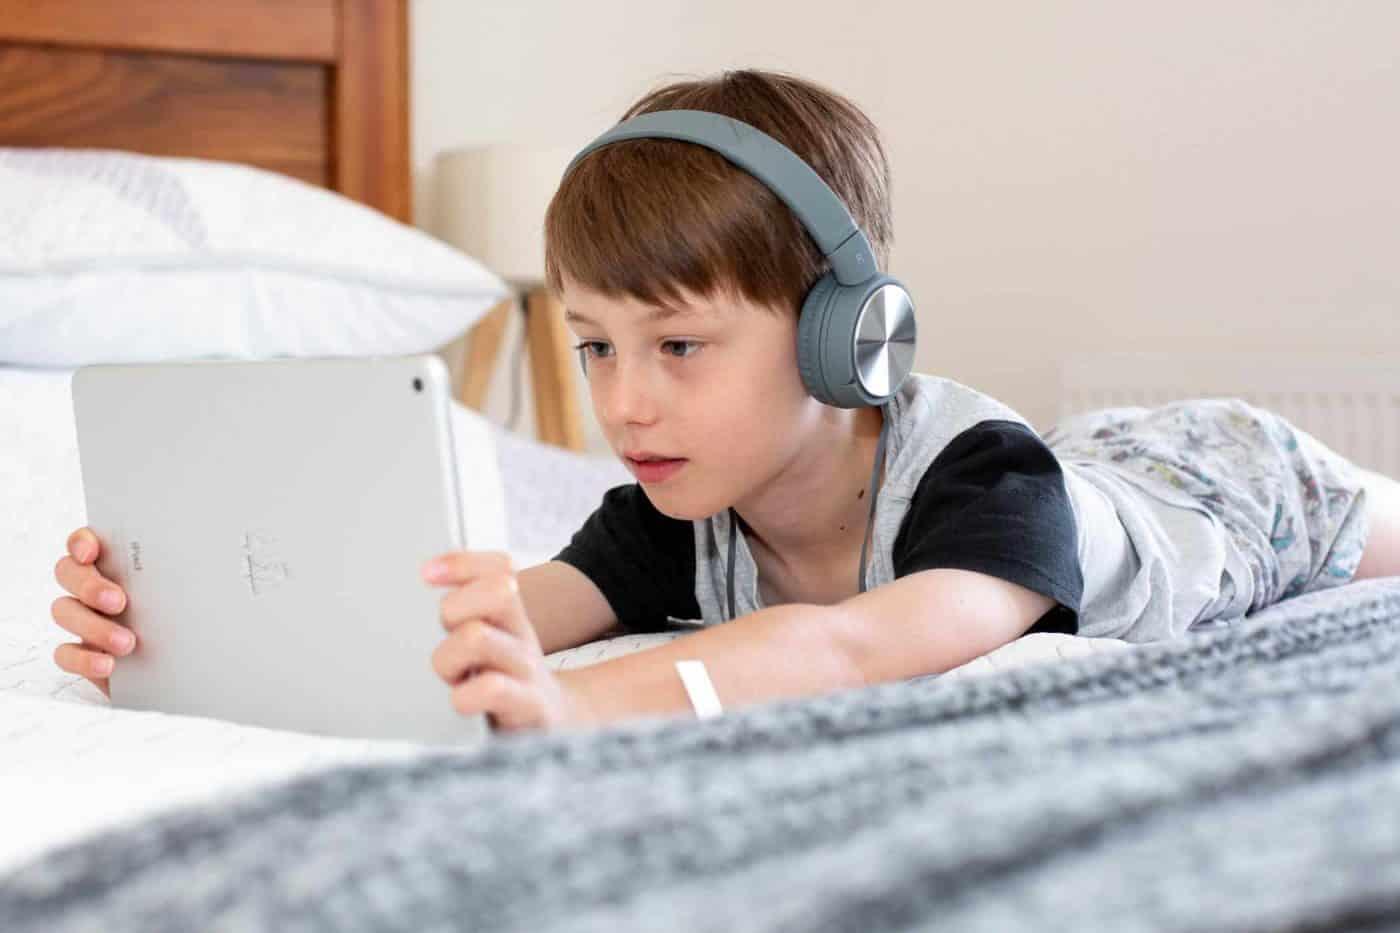 Nederlandse les via Skype en Zoom. Online lessen bij Dutch for Kids.